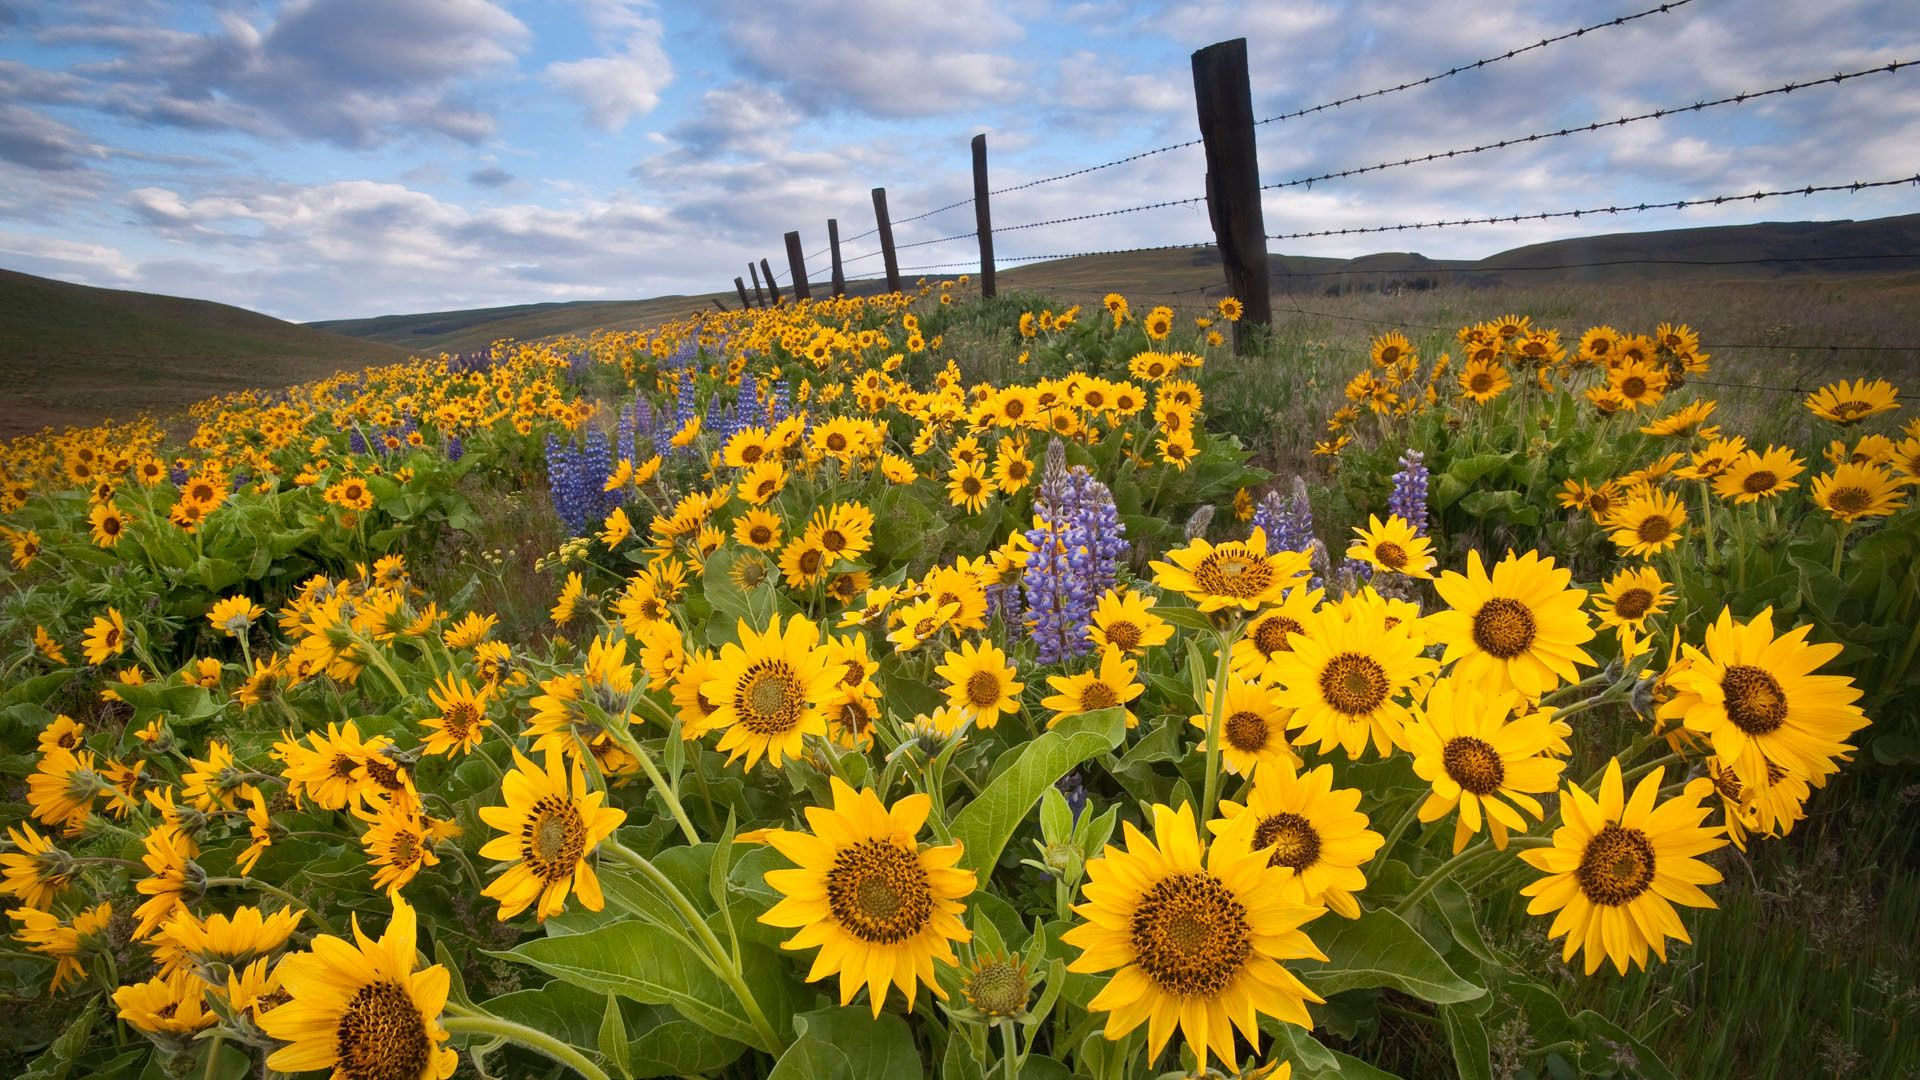 Desktop Sunflowers Flowers Field Fence Hd Desktop Wallpapers Sunflower Fields Beautiful Flowers Pictures Garden Pictures